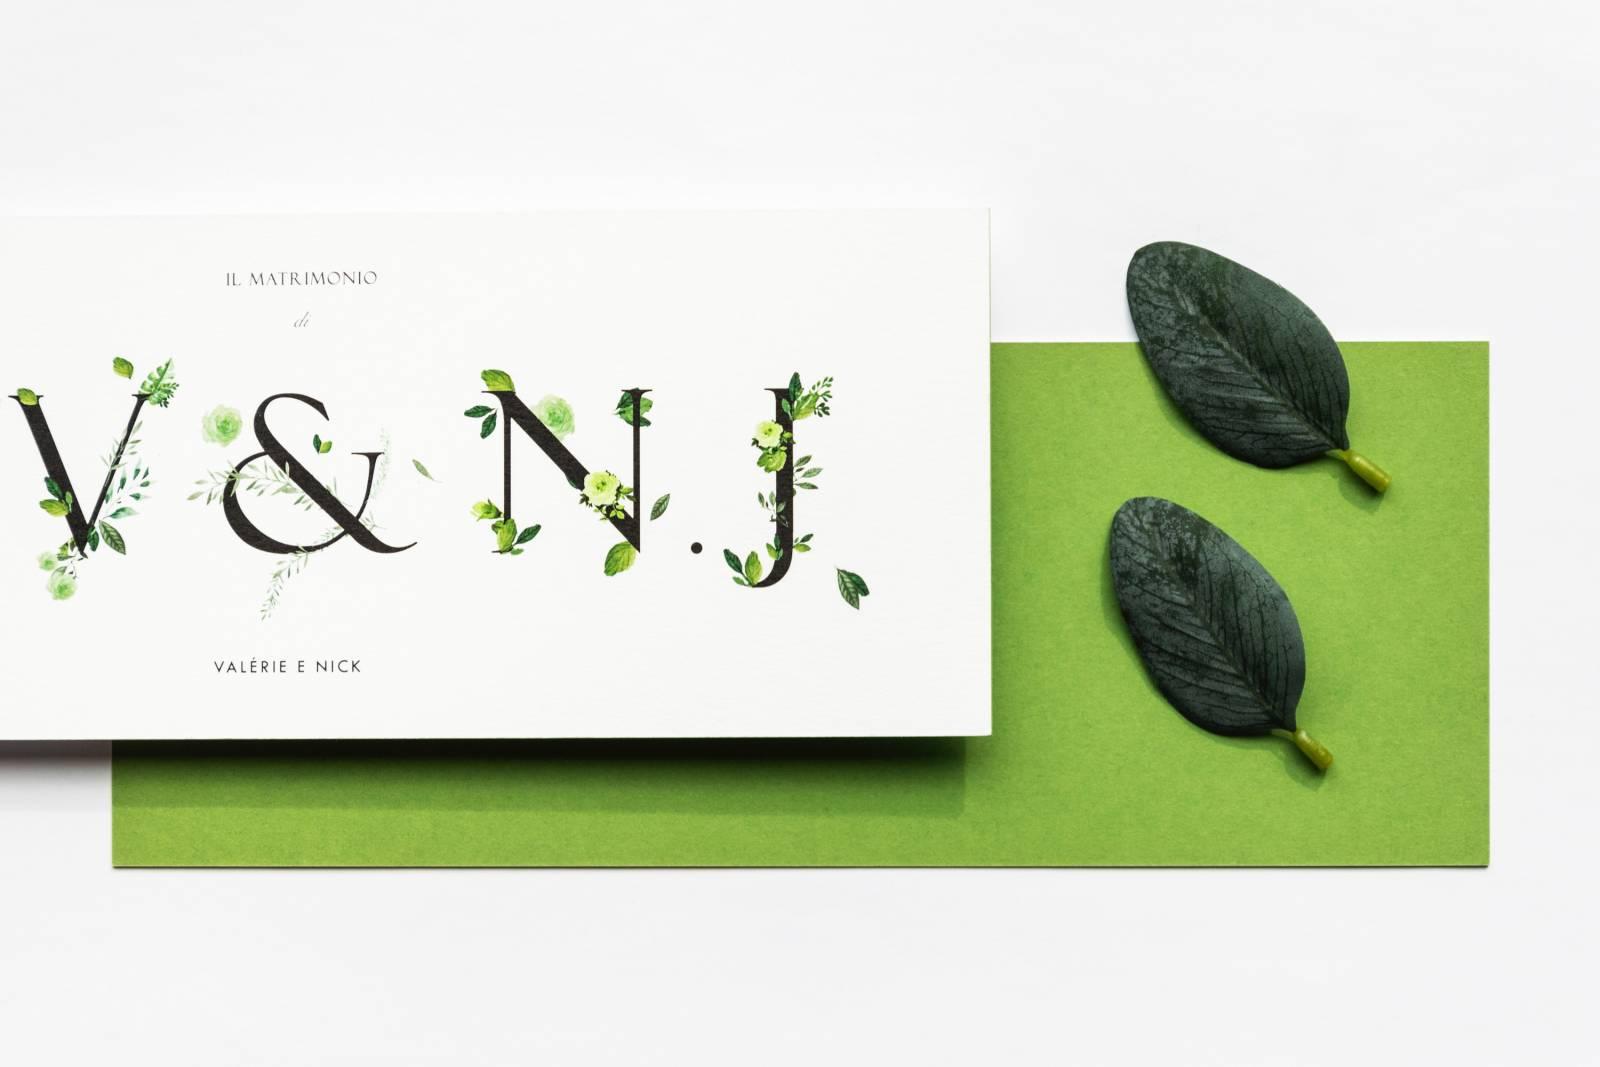 Designcards - trouwuitnodiging - drukwerk huwelijk - grafisch design - House of Weddings - 20